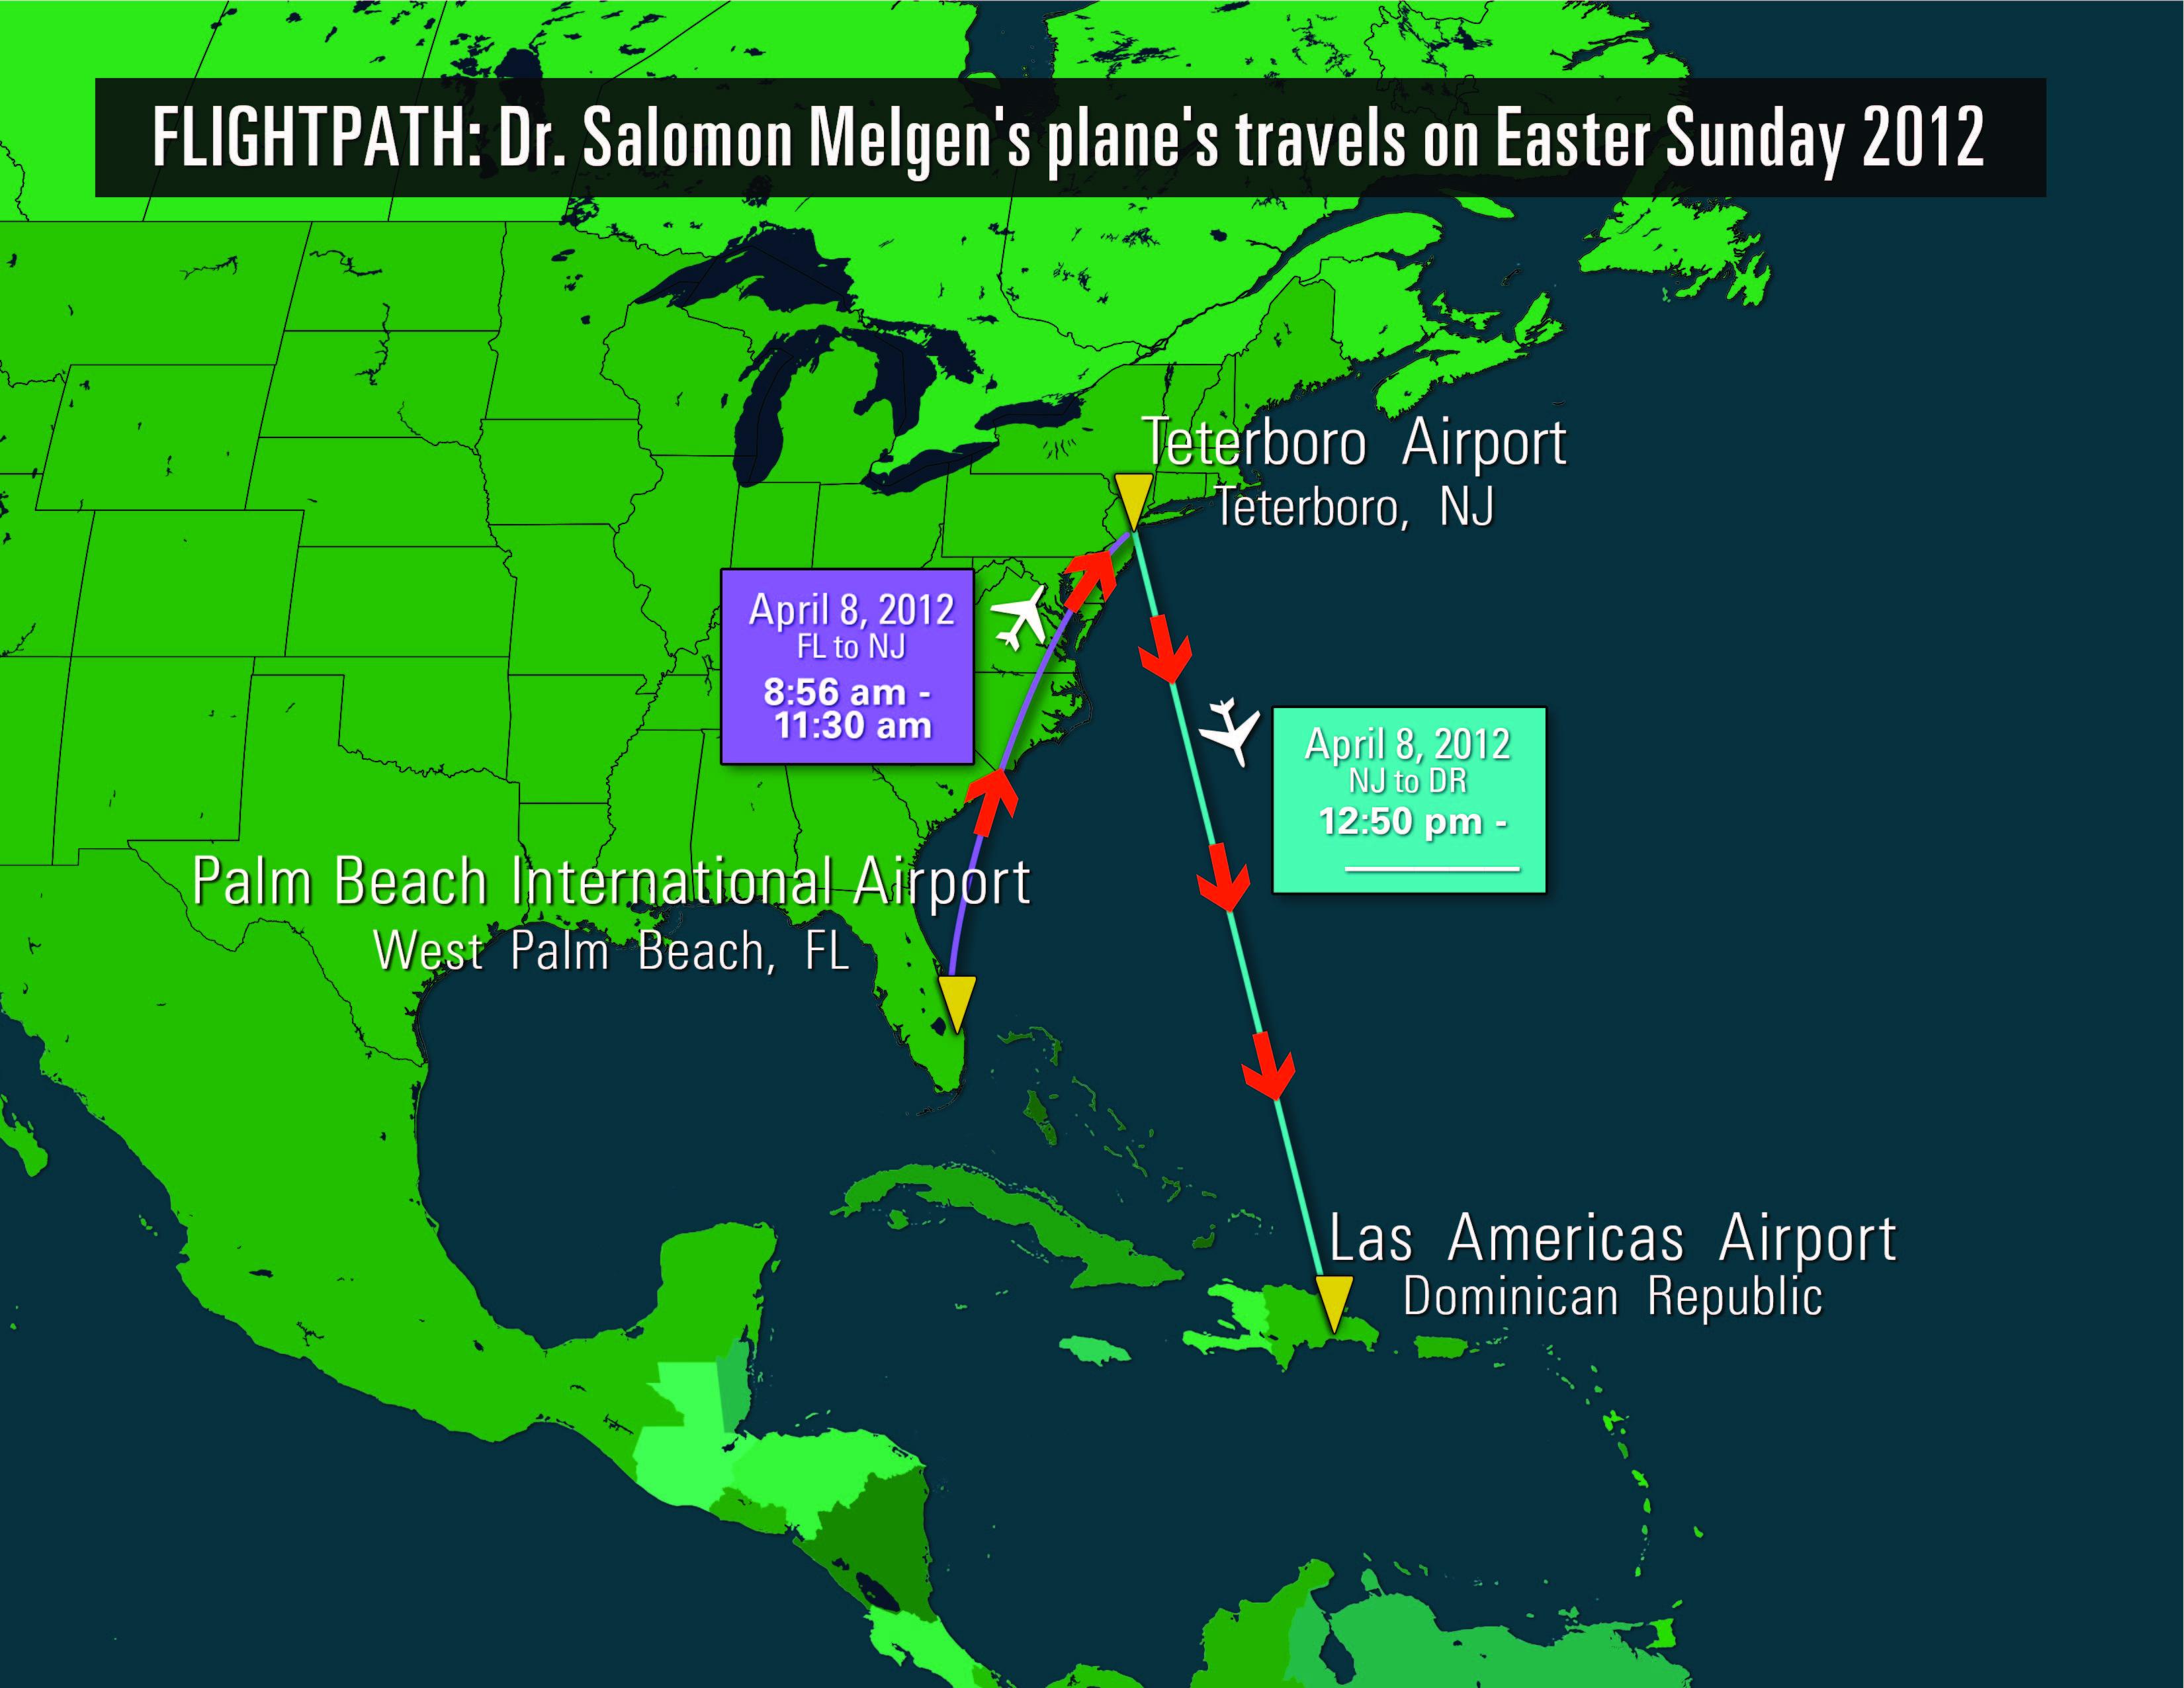 Spring Break: Flight Records Suggest Fourth Menendez Flight